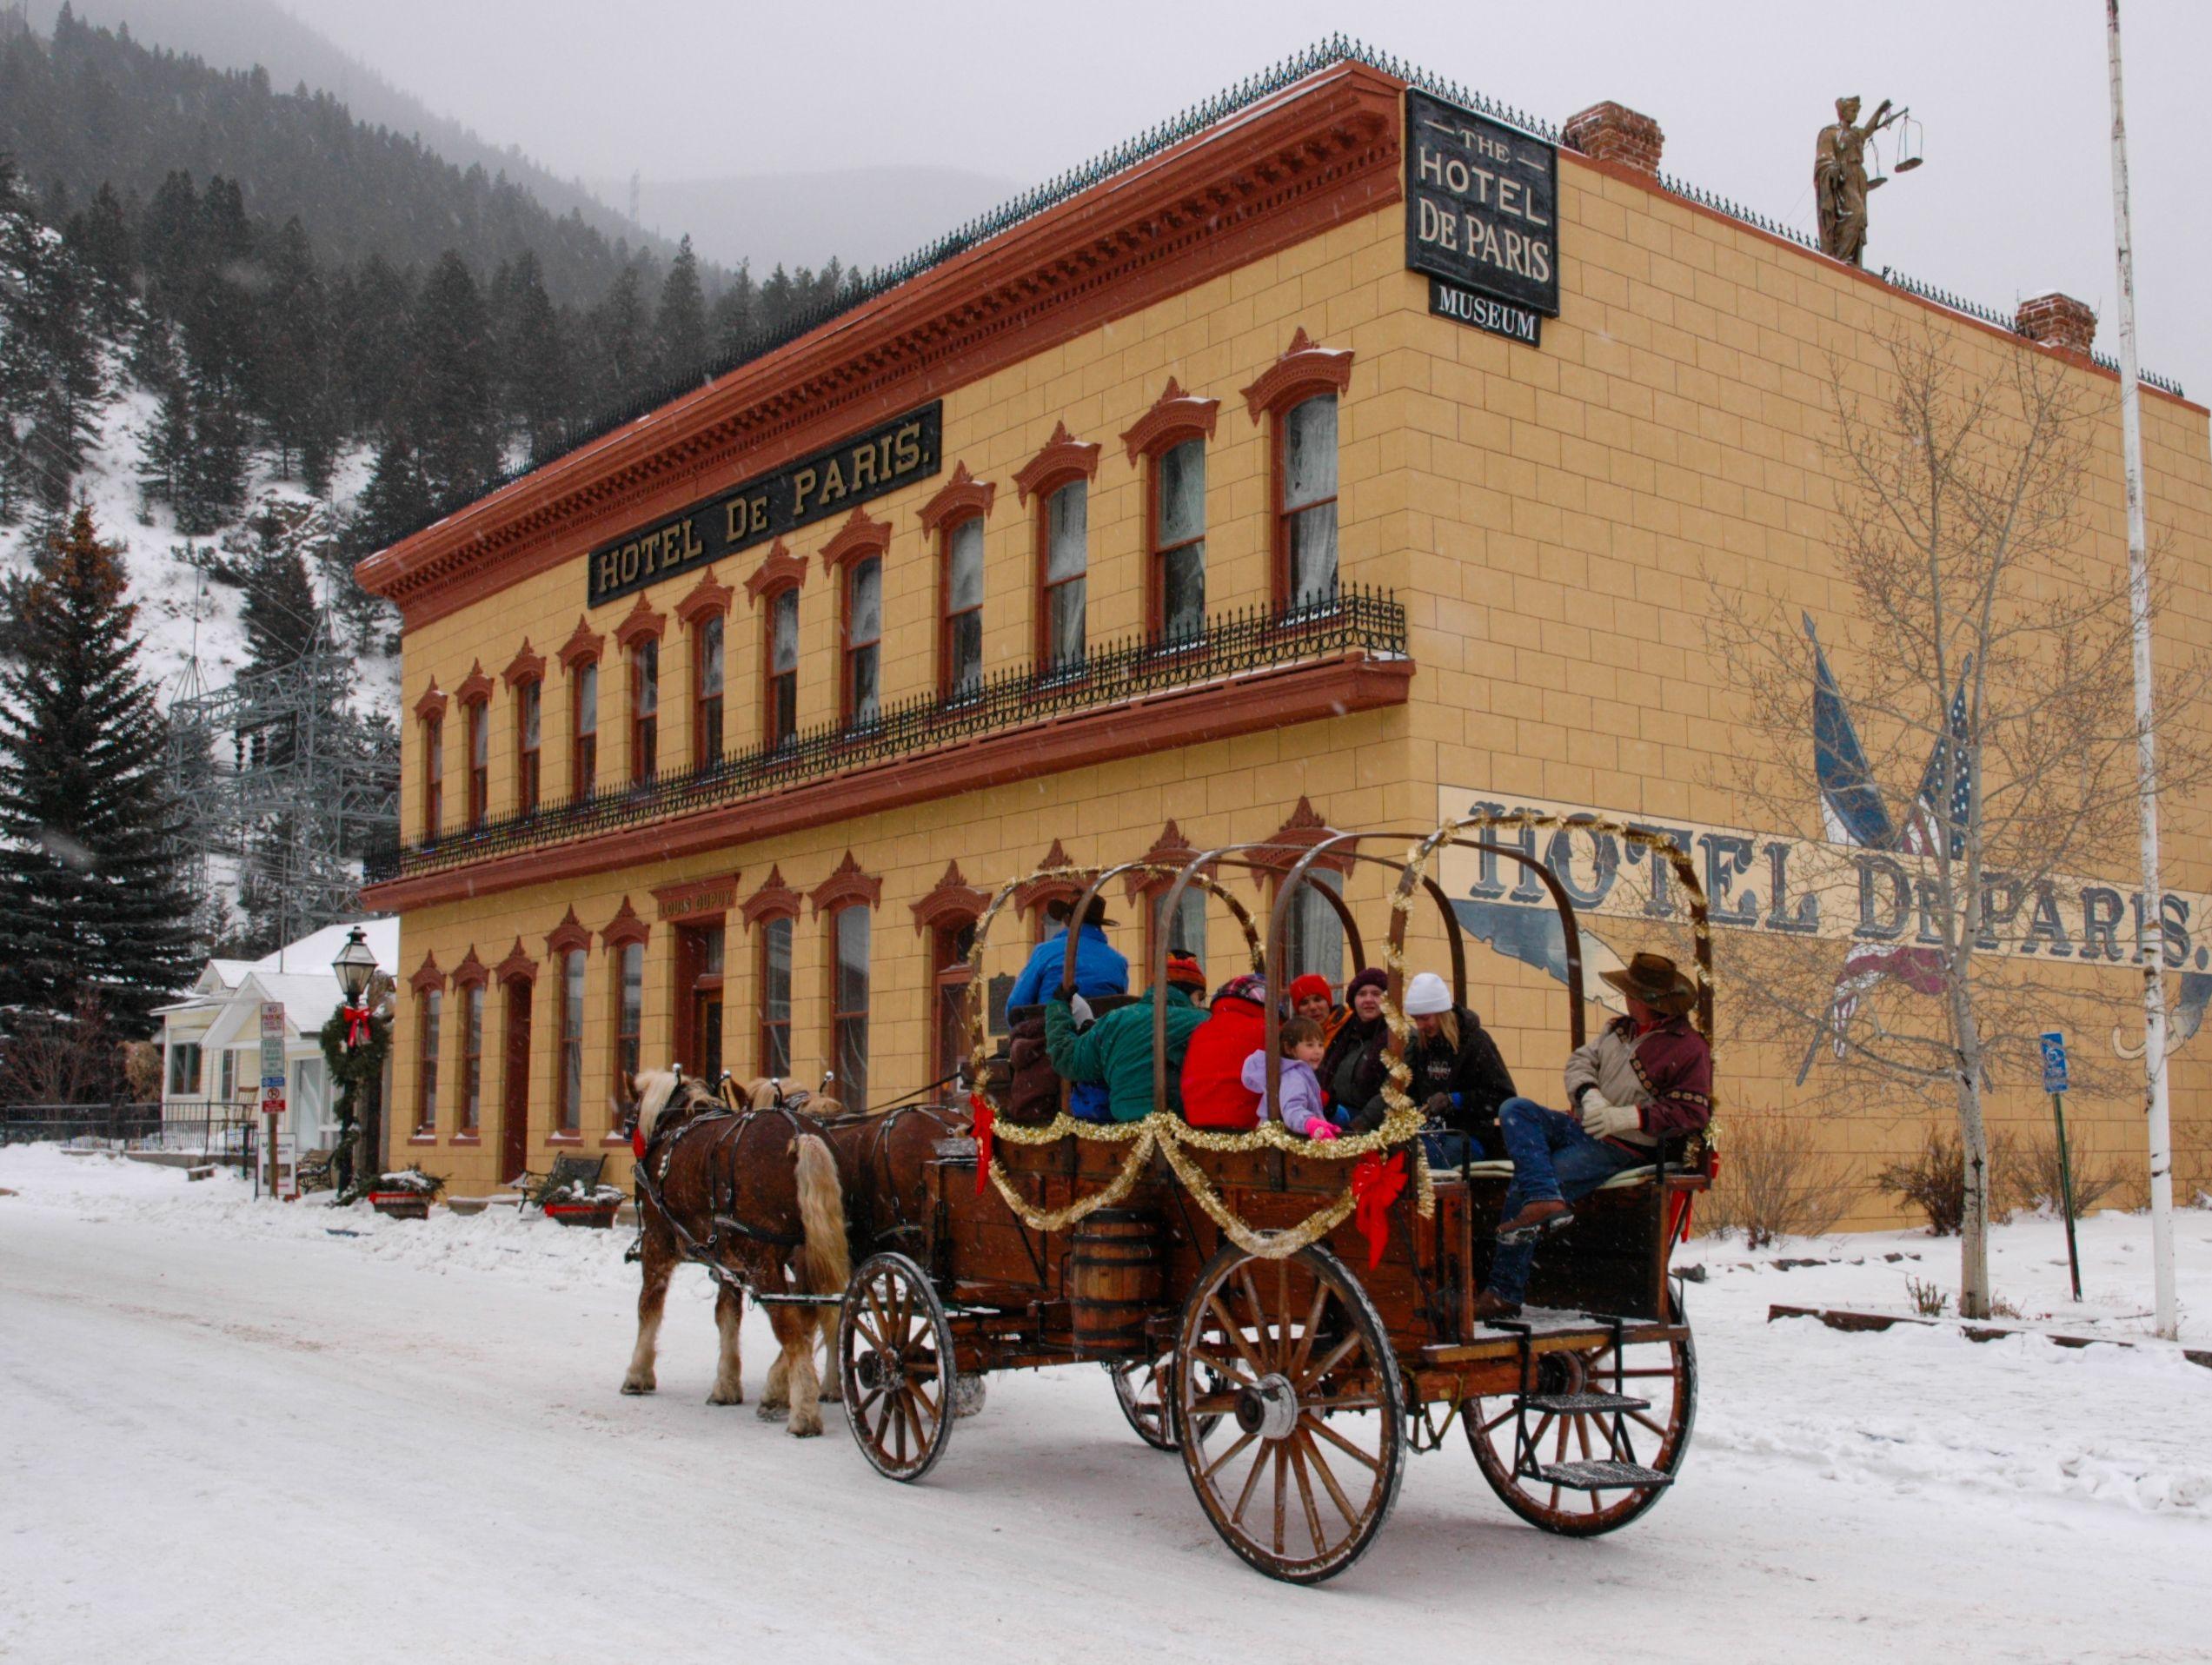 Annual Georgetown Christmas Market Hotel De Paris Museum